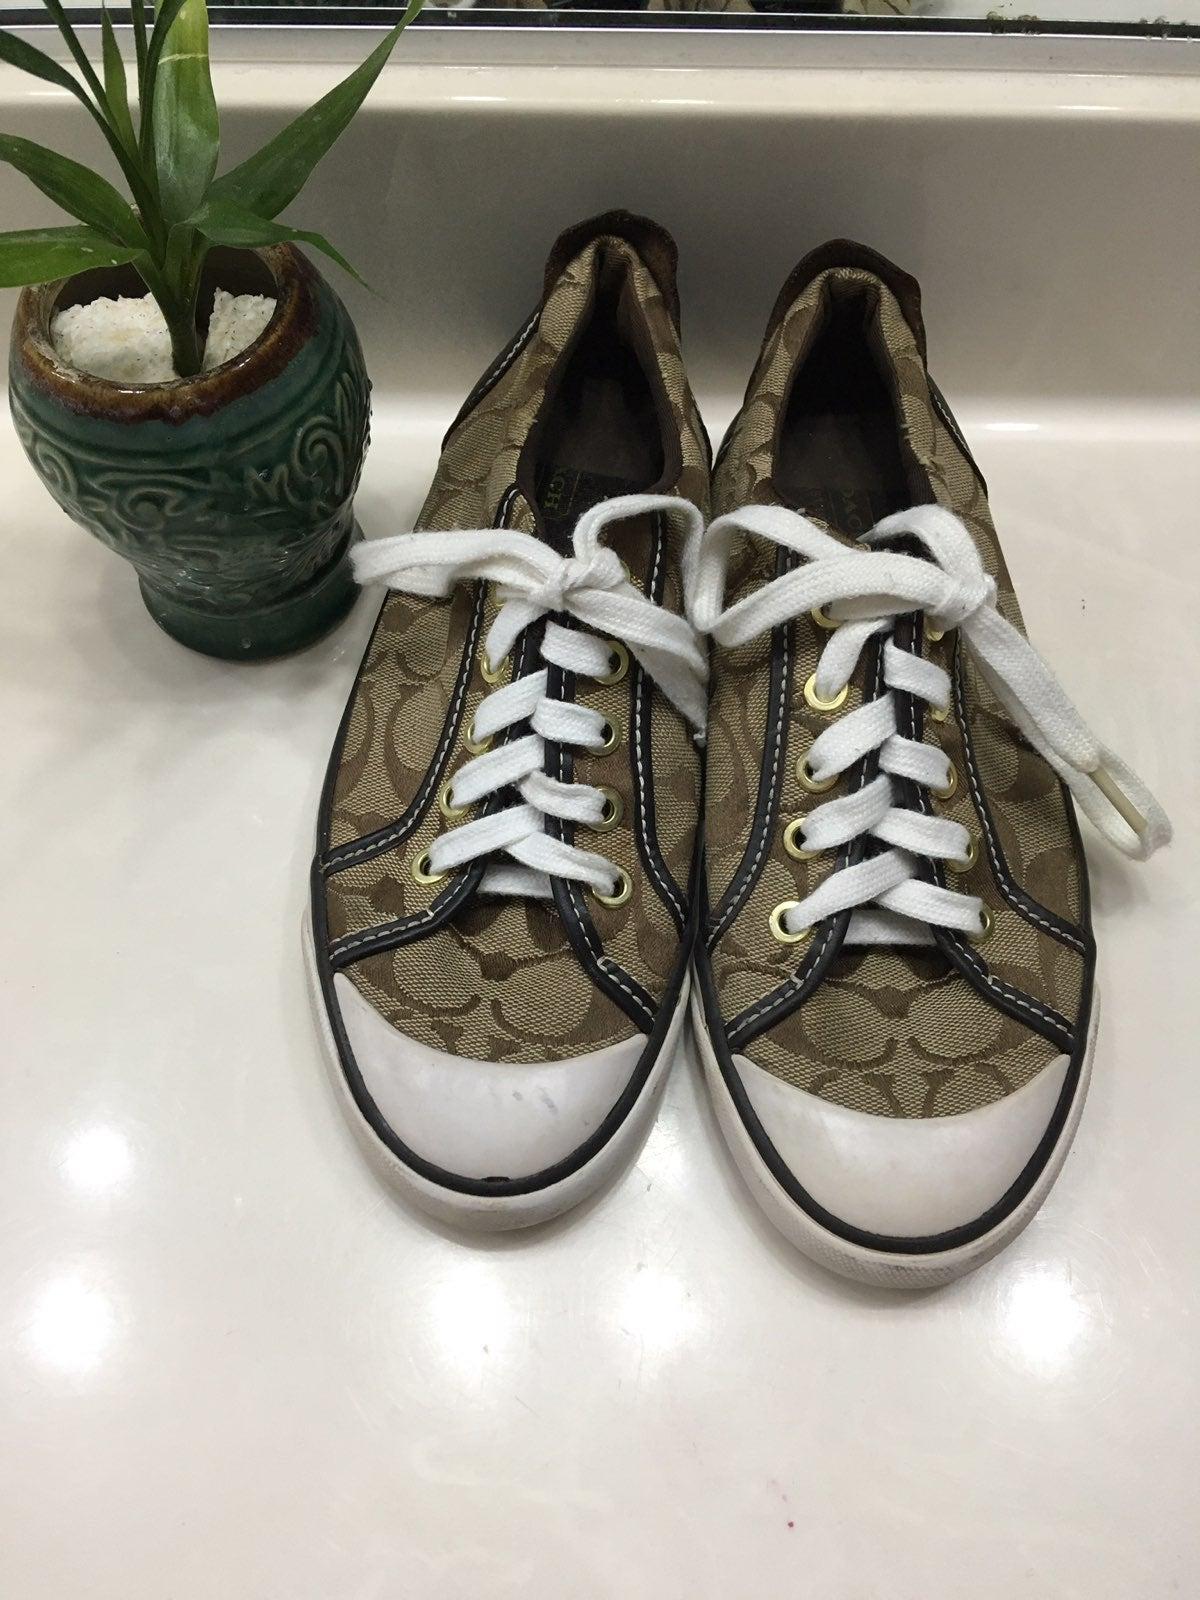 BARRETT Monogram Print Lace Up Sneakers